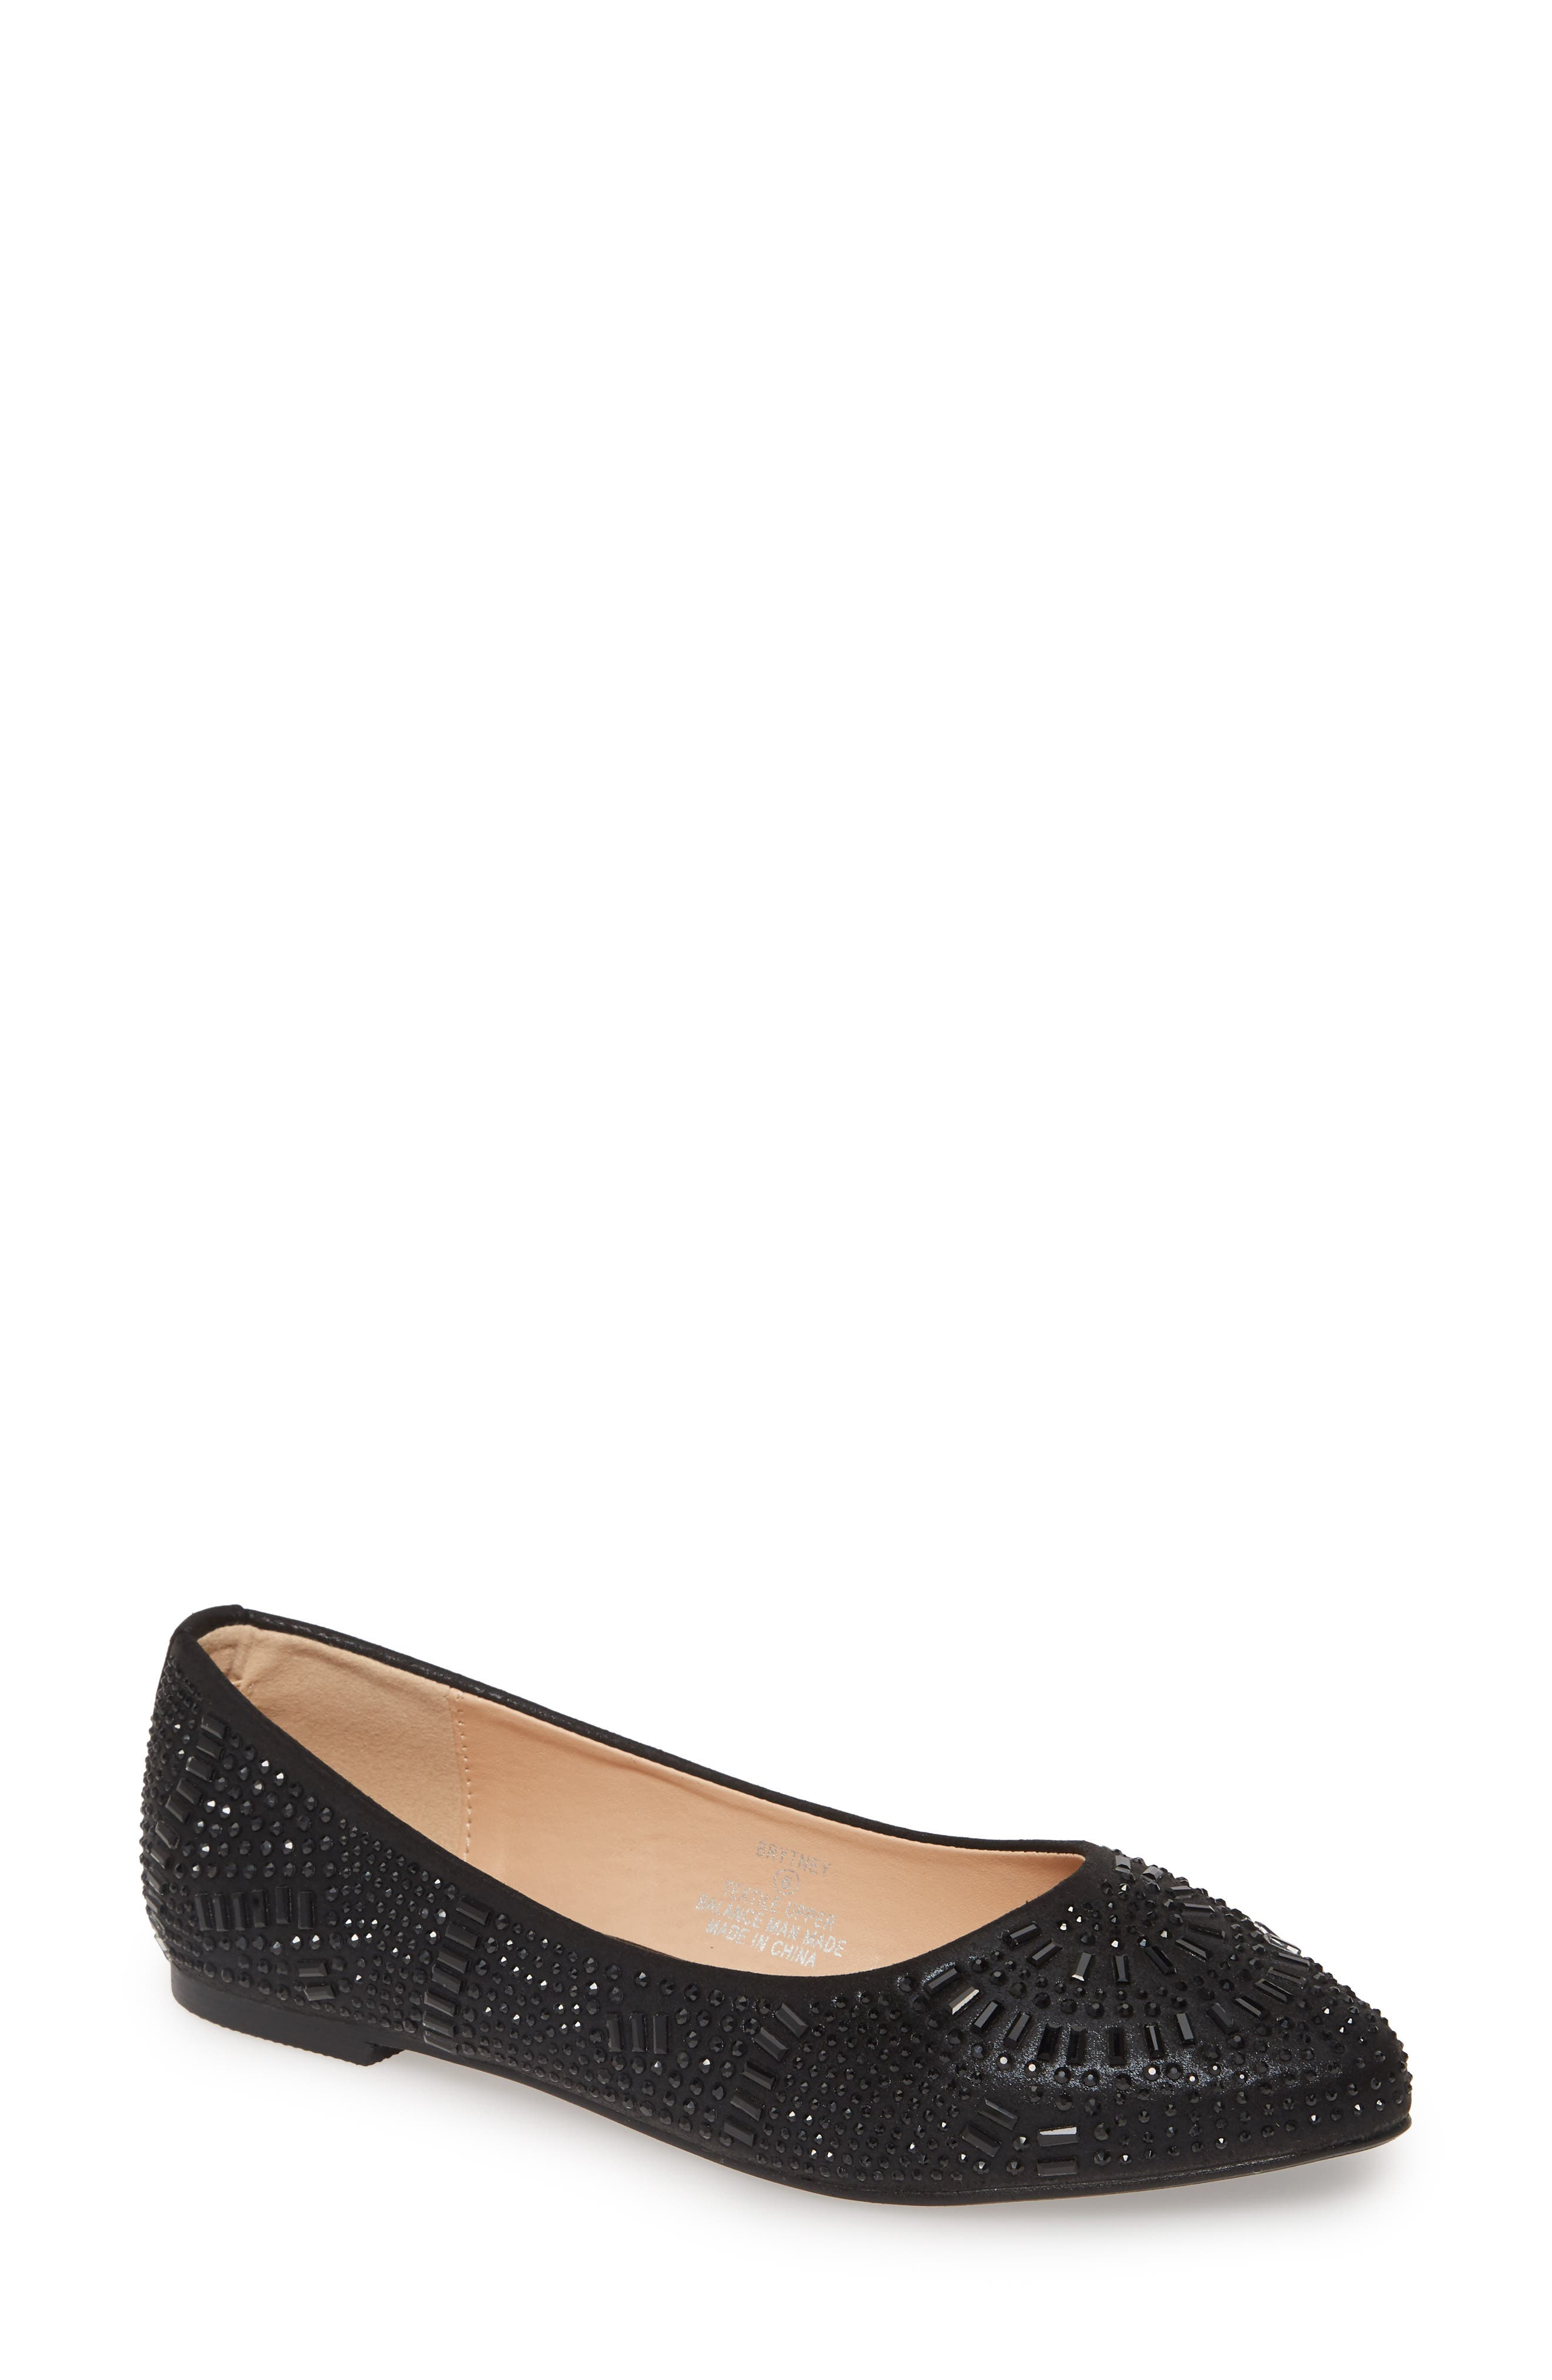 Lauren Lorraine Brytney Embellished Flat, Black